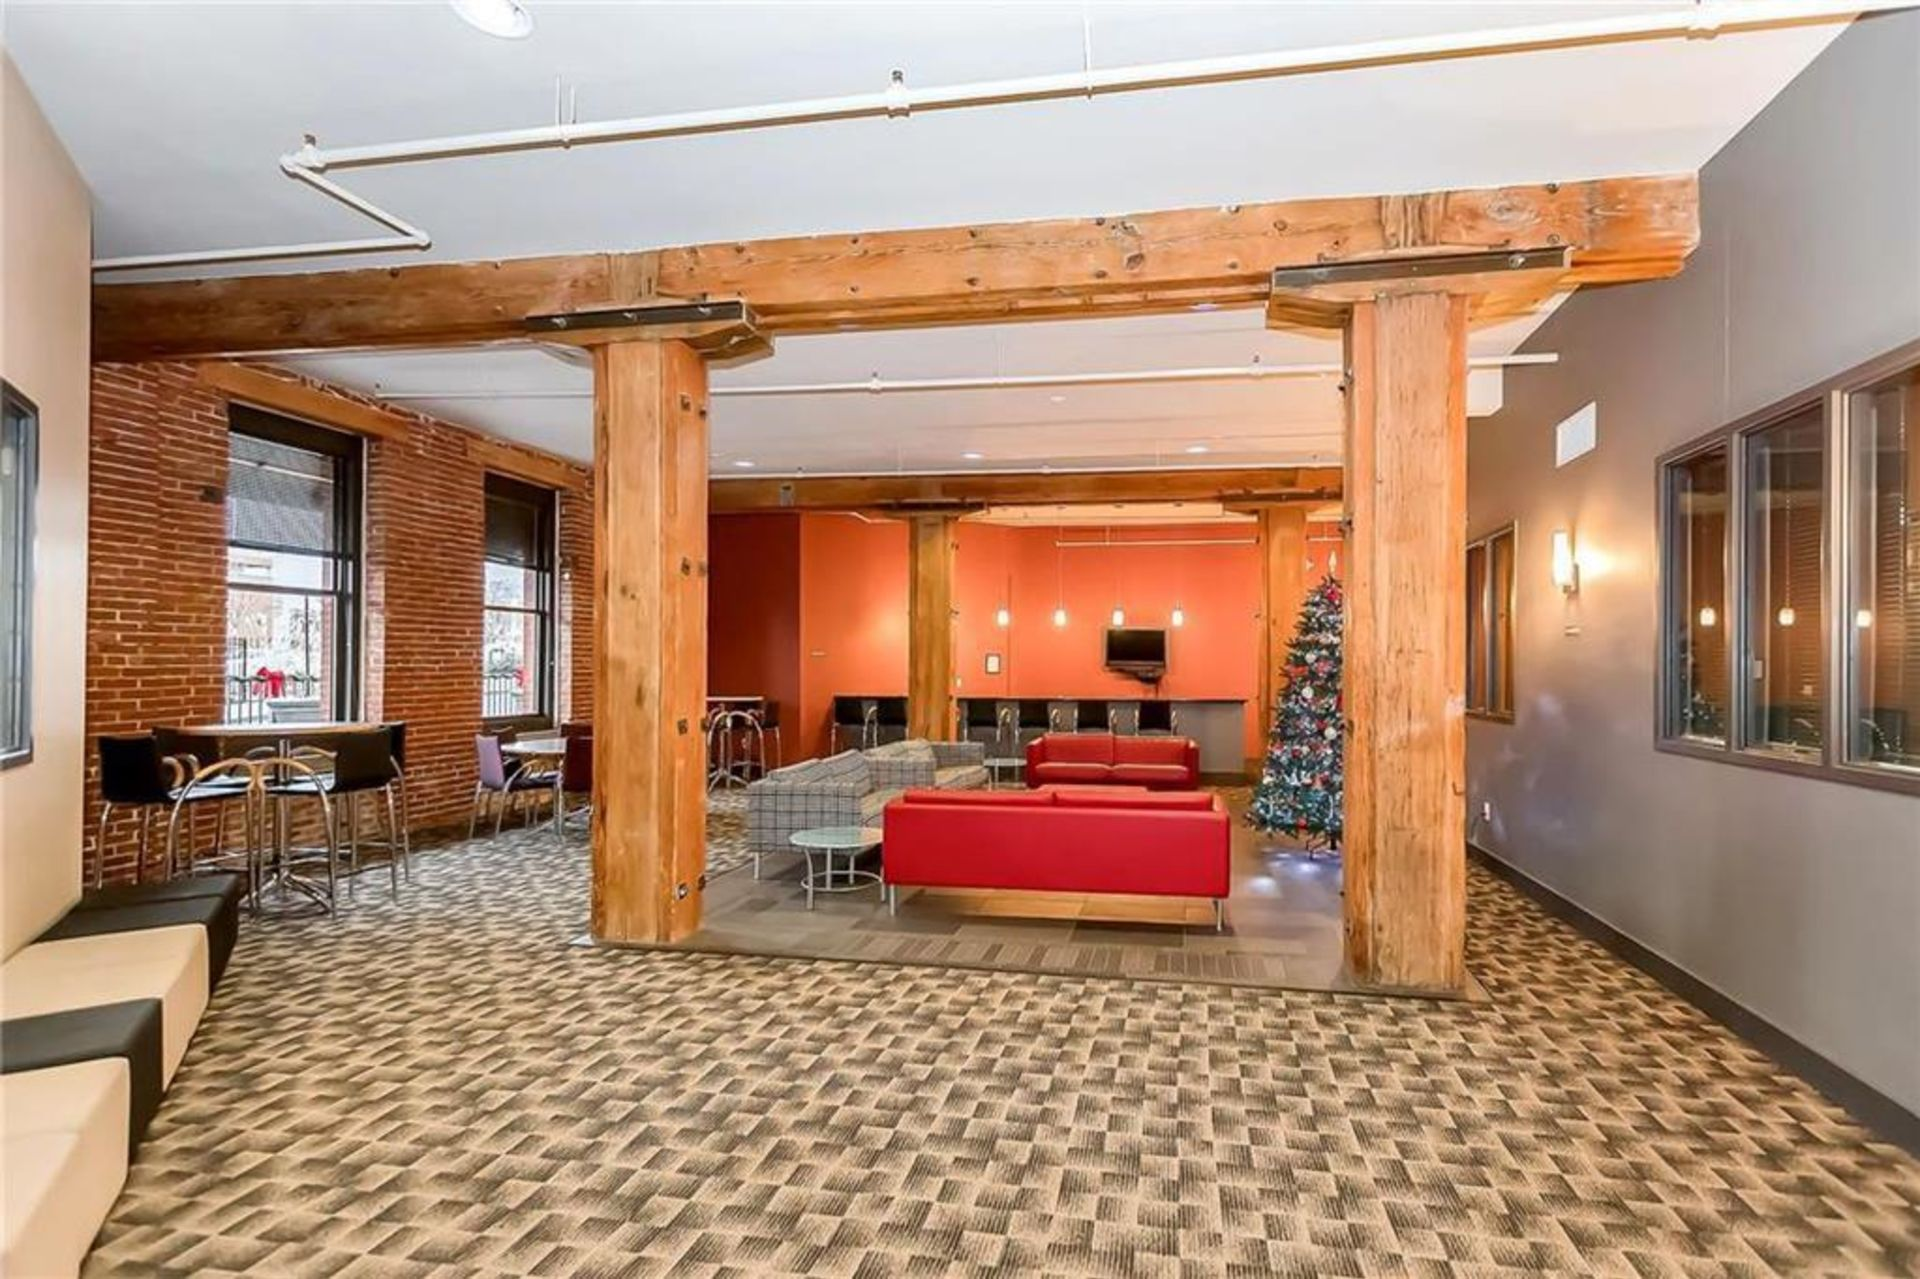 Condo for sale Rivermarket riverbend lofts